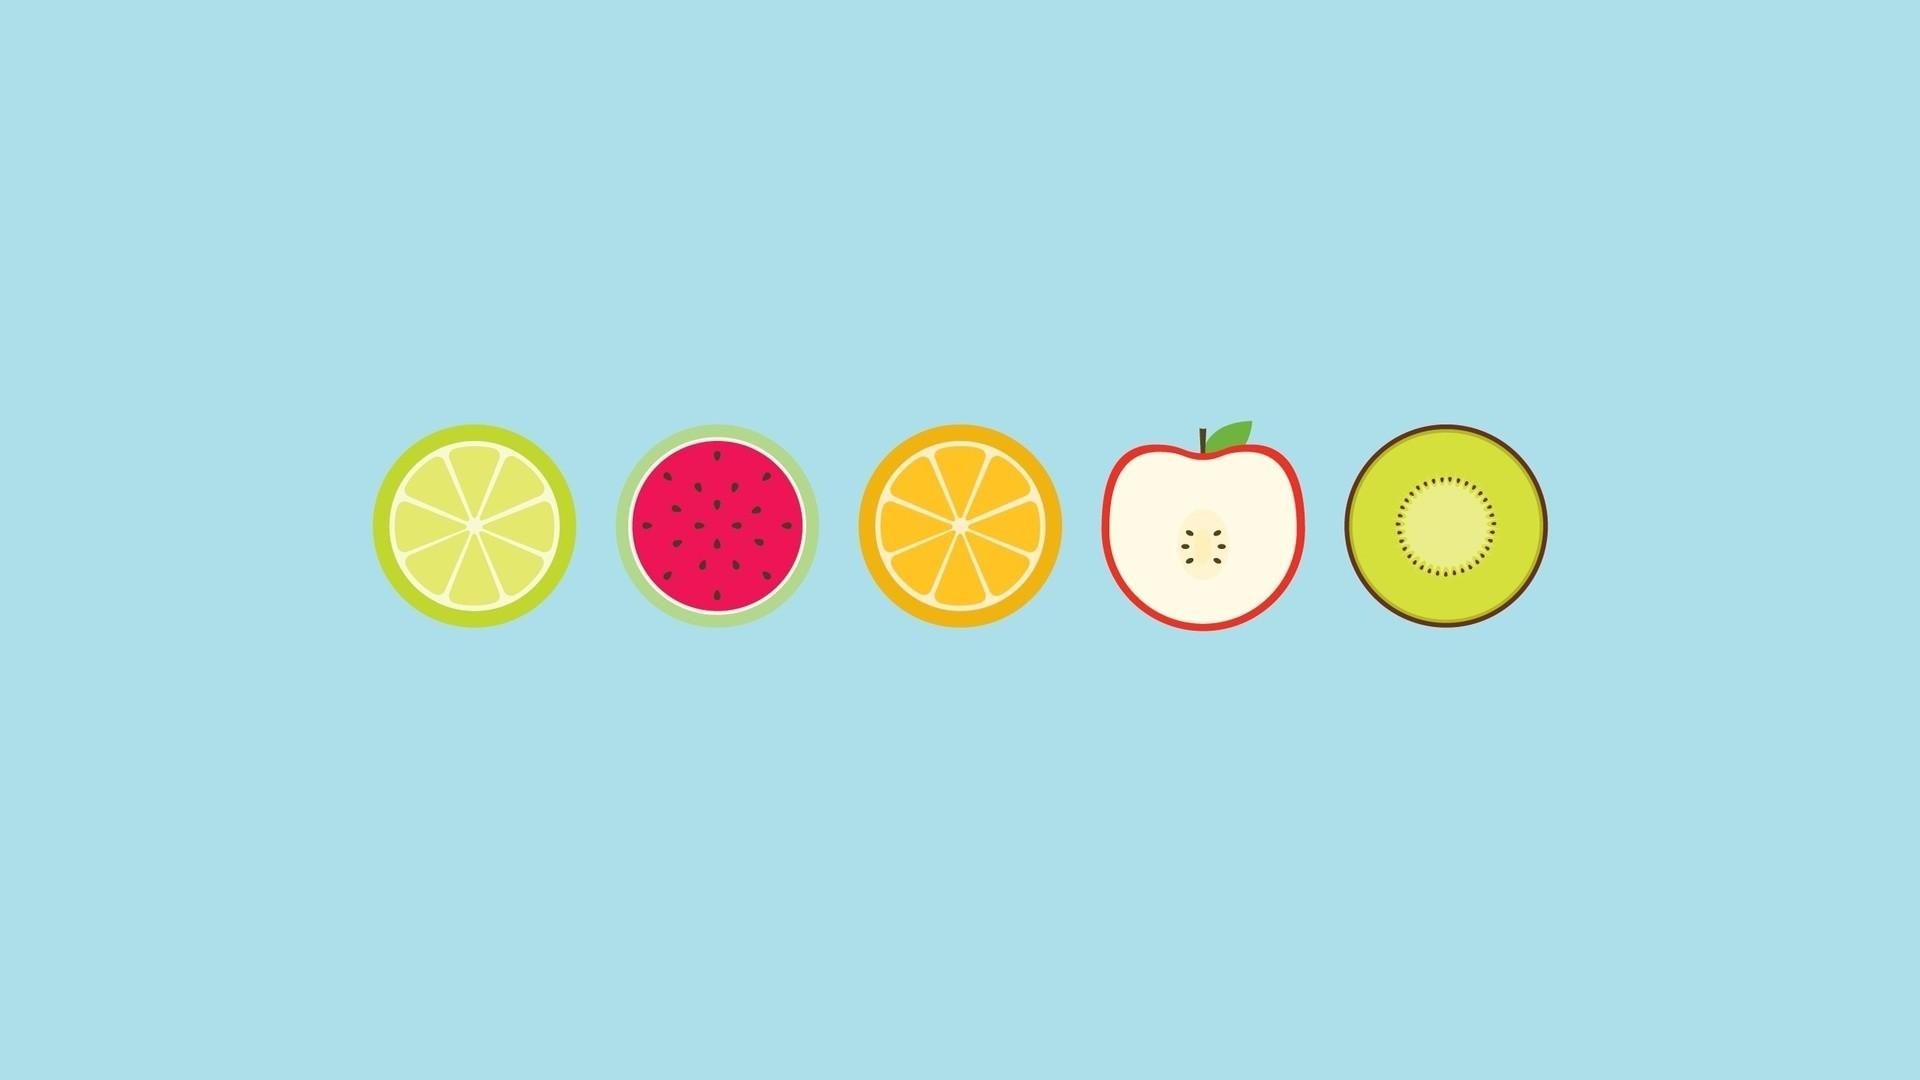 Cute Simple wallpaper photo hd